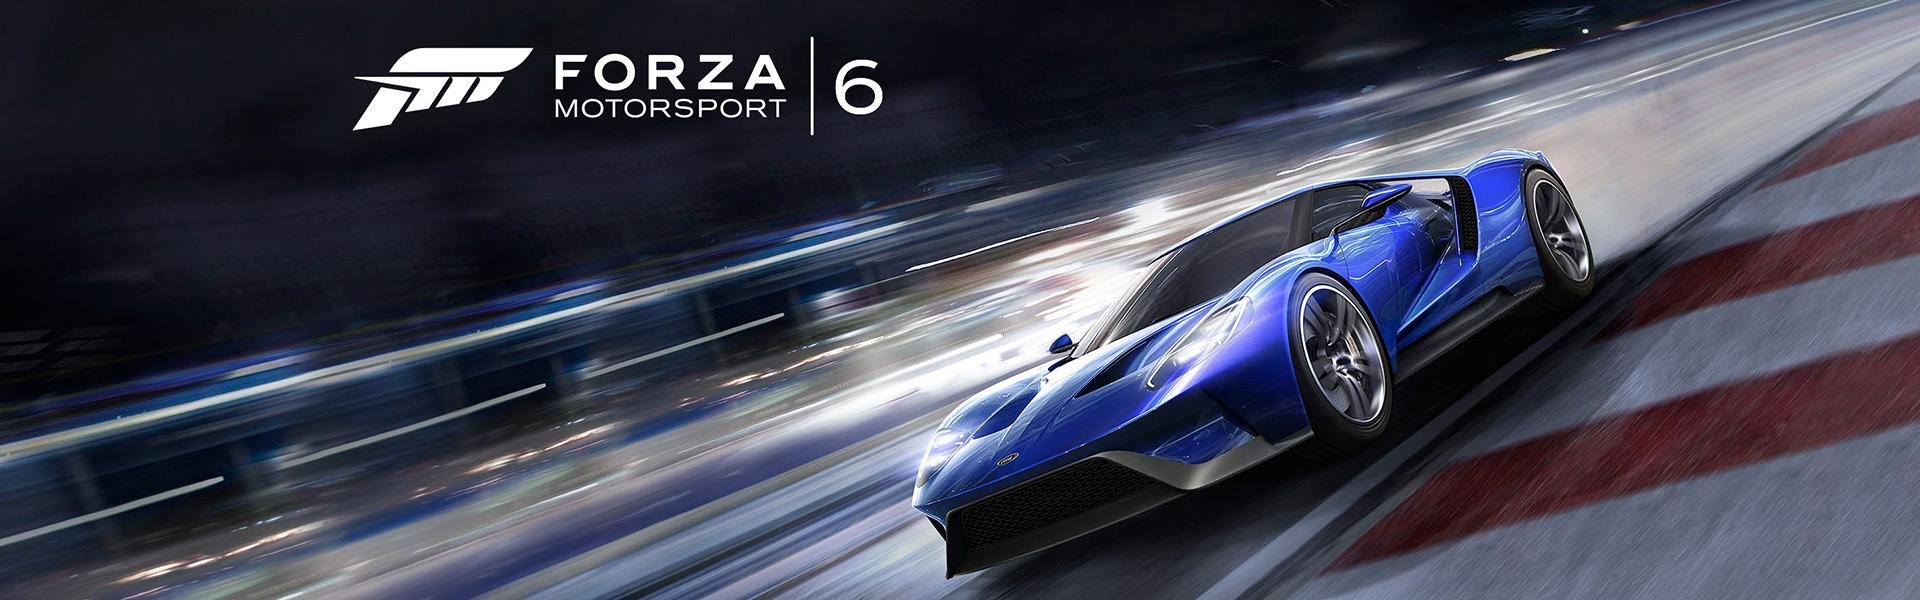 Forza Motorsport 6 Forza Motorsport 6 for